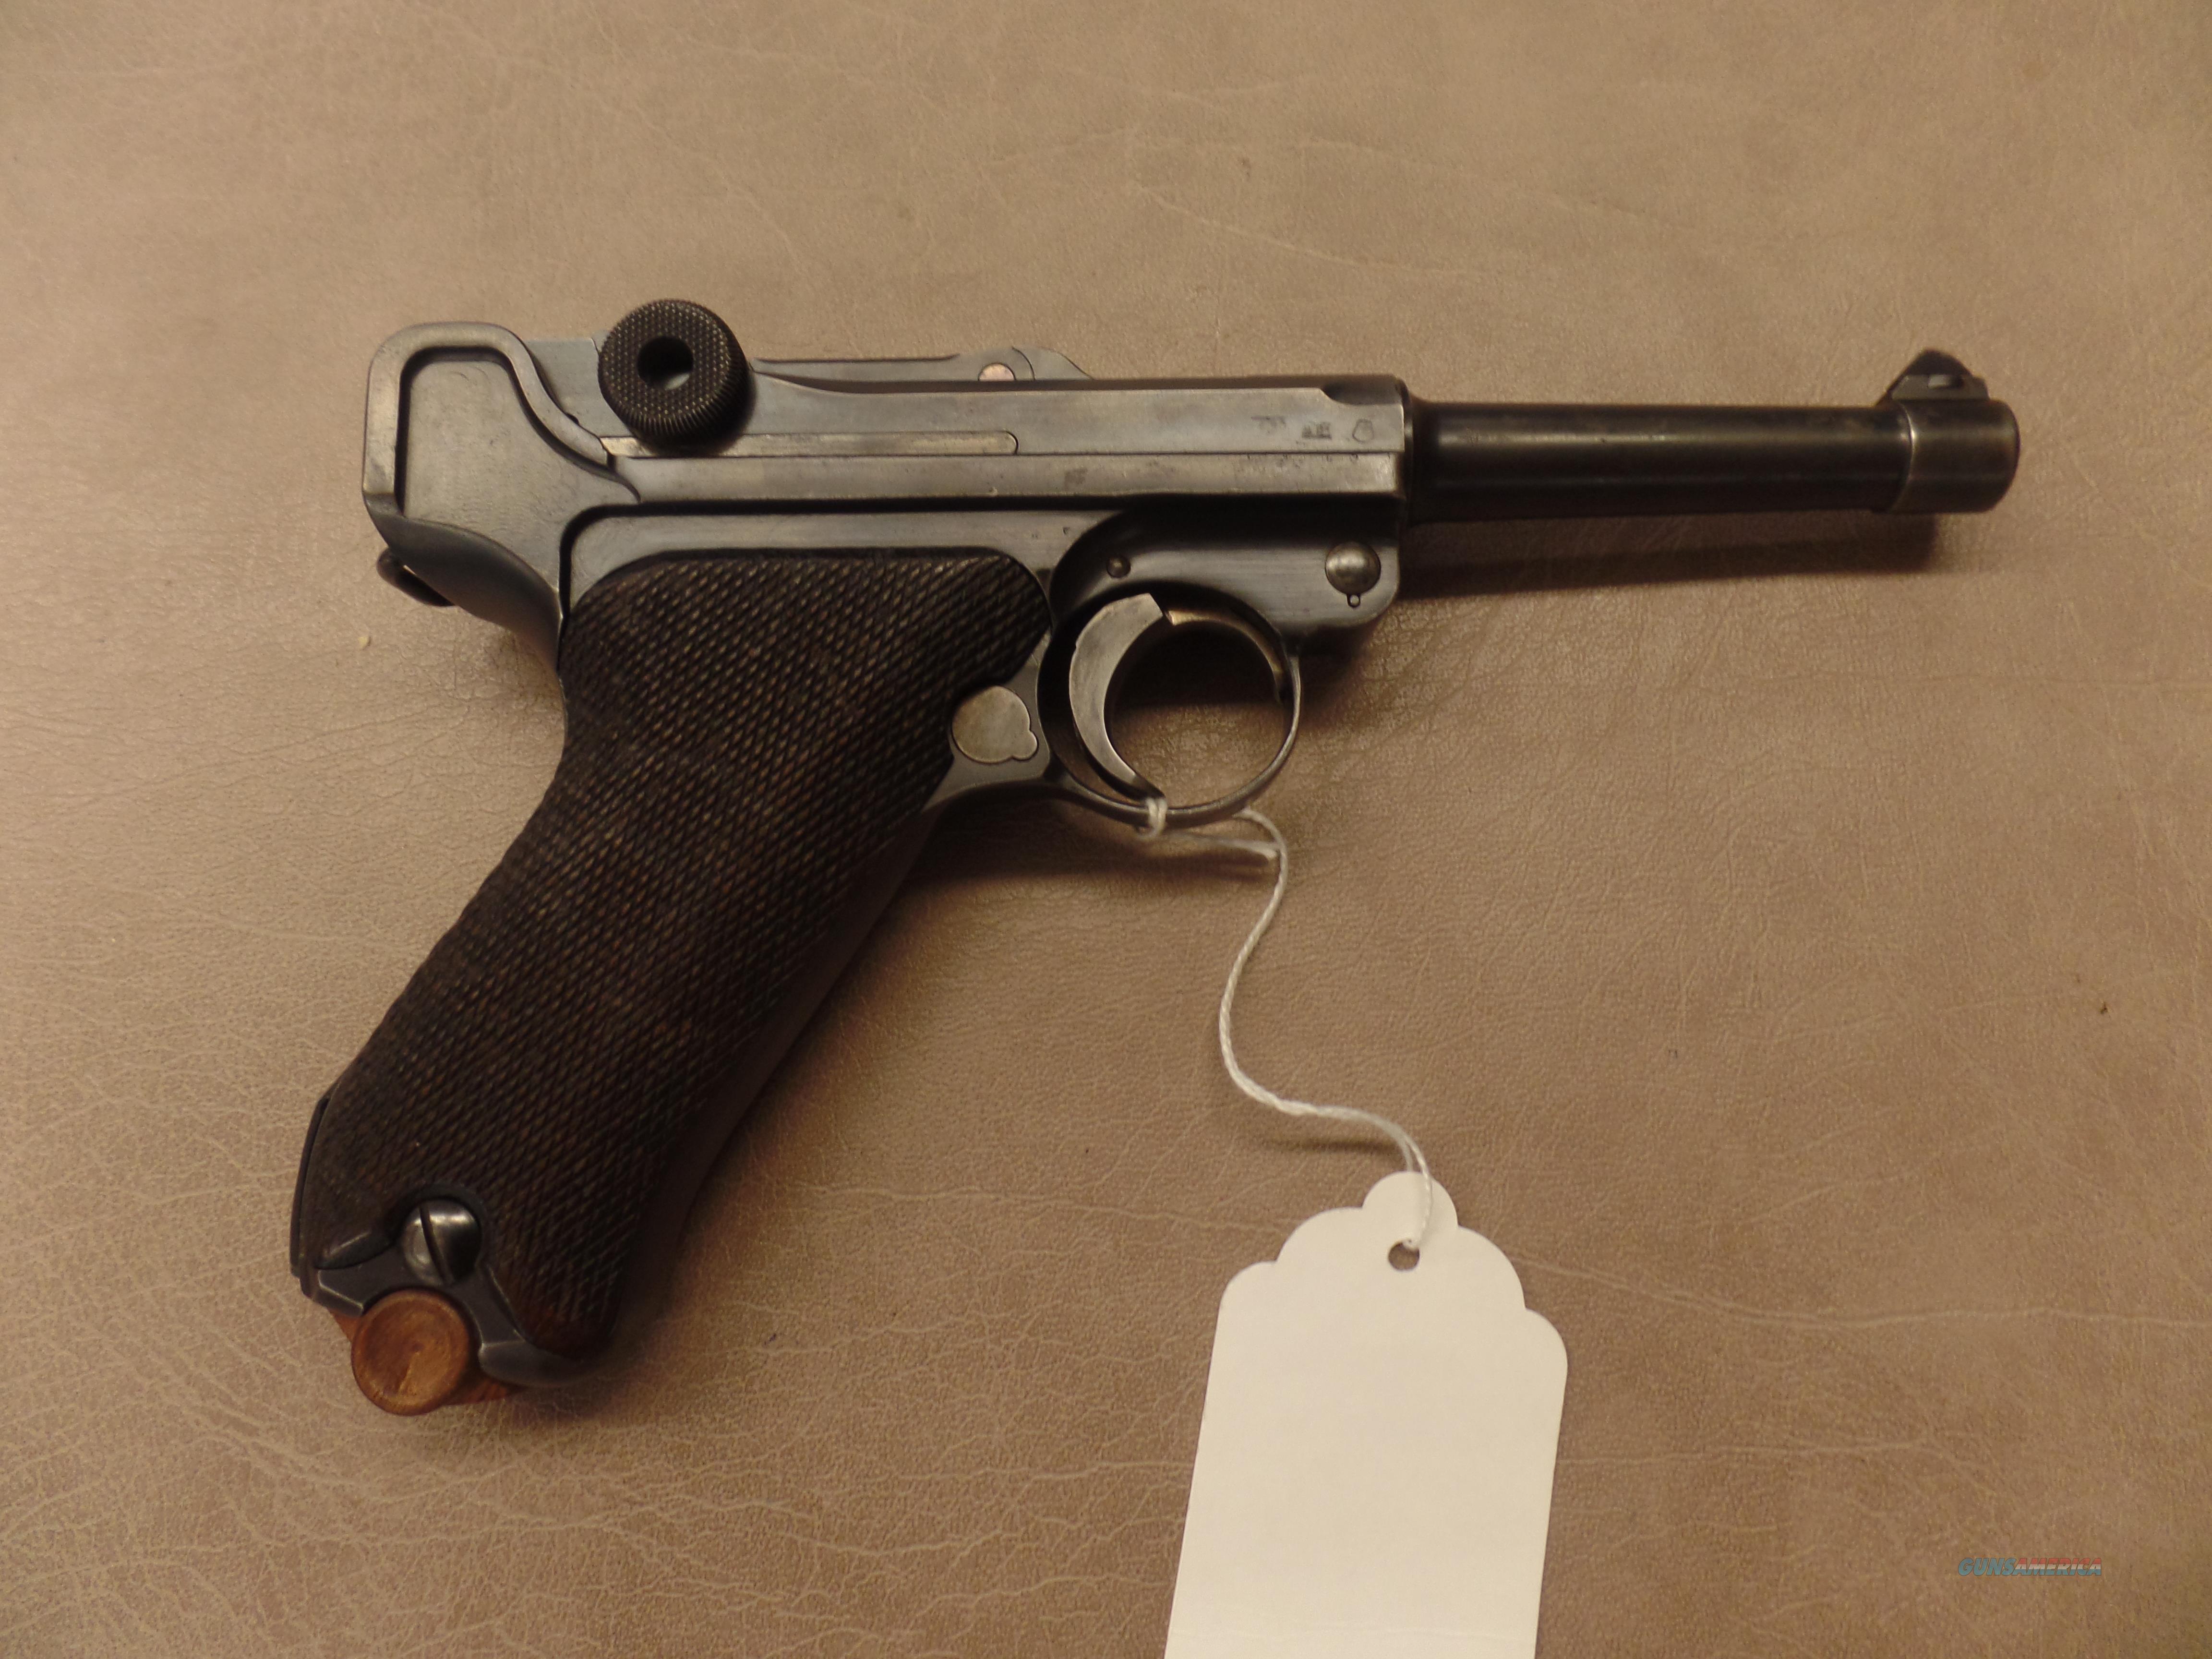 WWII Mauser S/42 G Date 1935  Guns > Pistols > Mauser Pistols